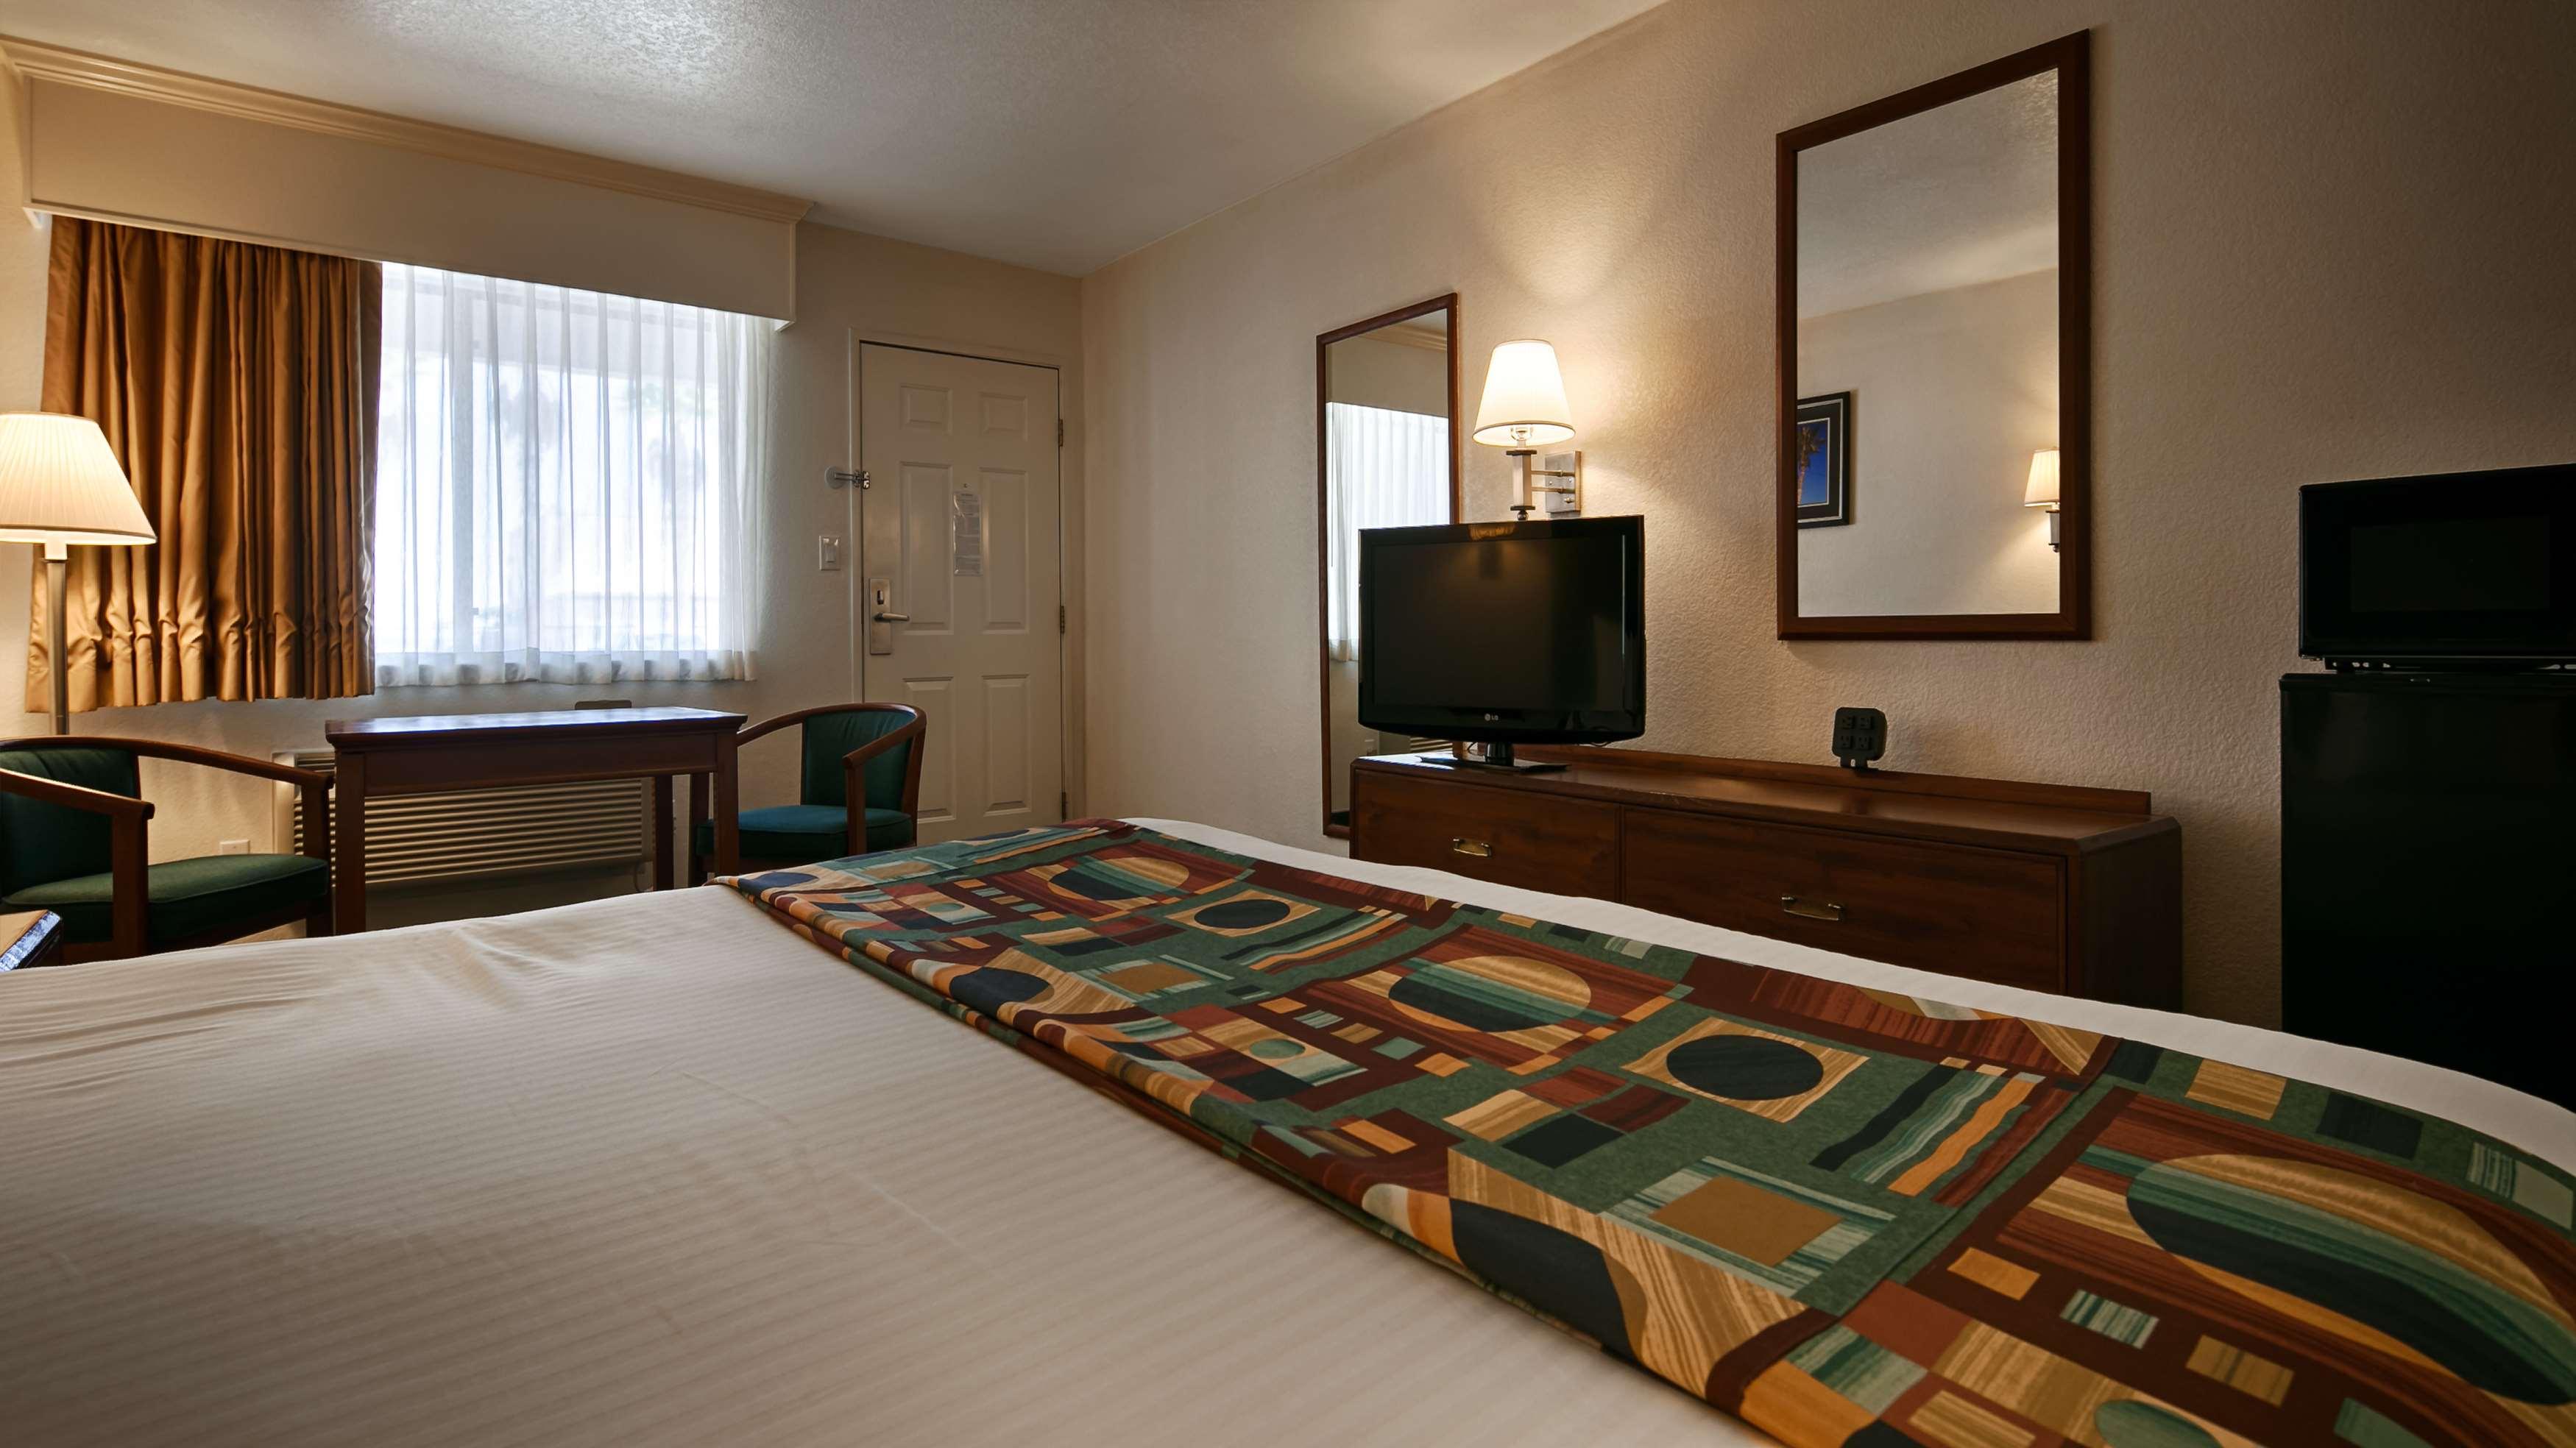 Best Western Colorado River Inn image 15